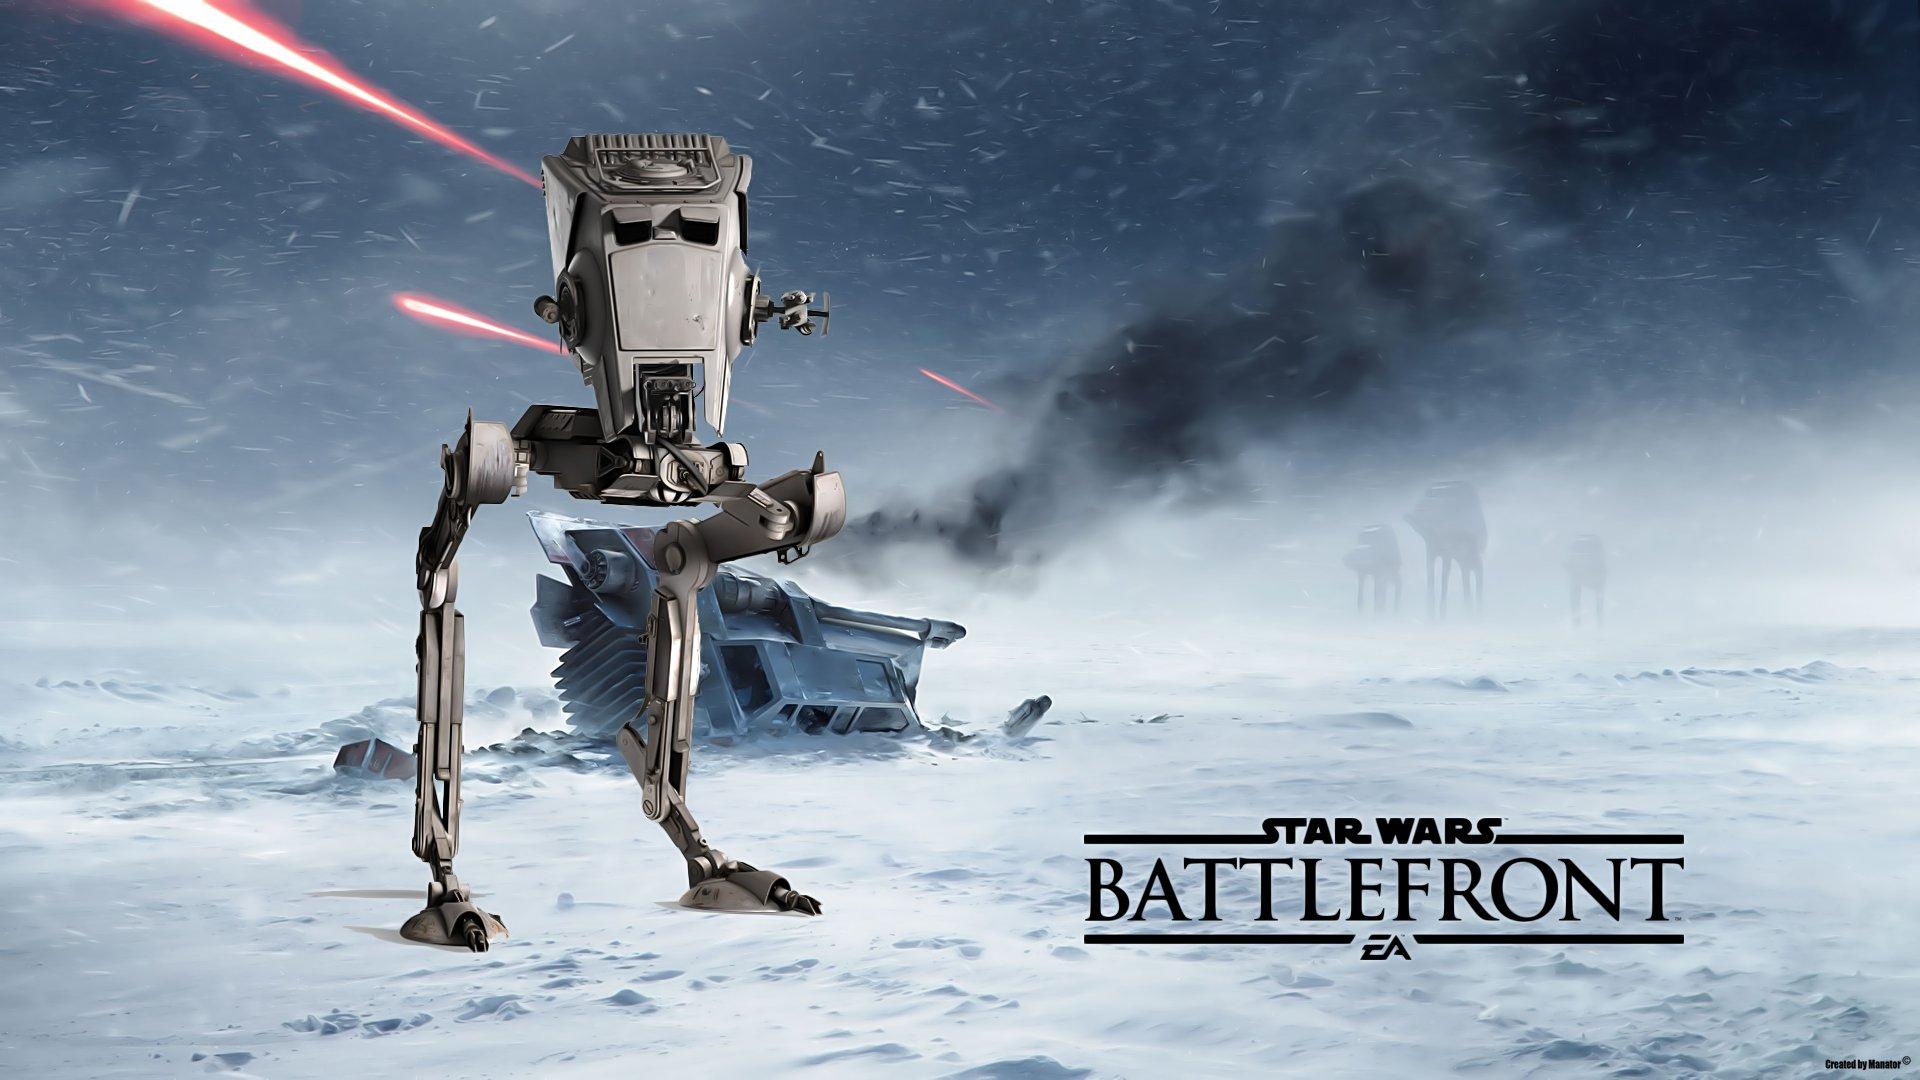 Star Wars Star Wars Battlefront Wallpapers HD Desktop and